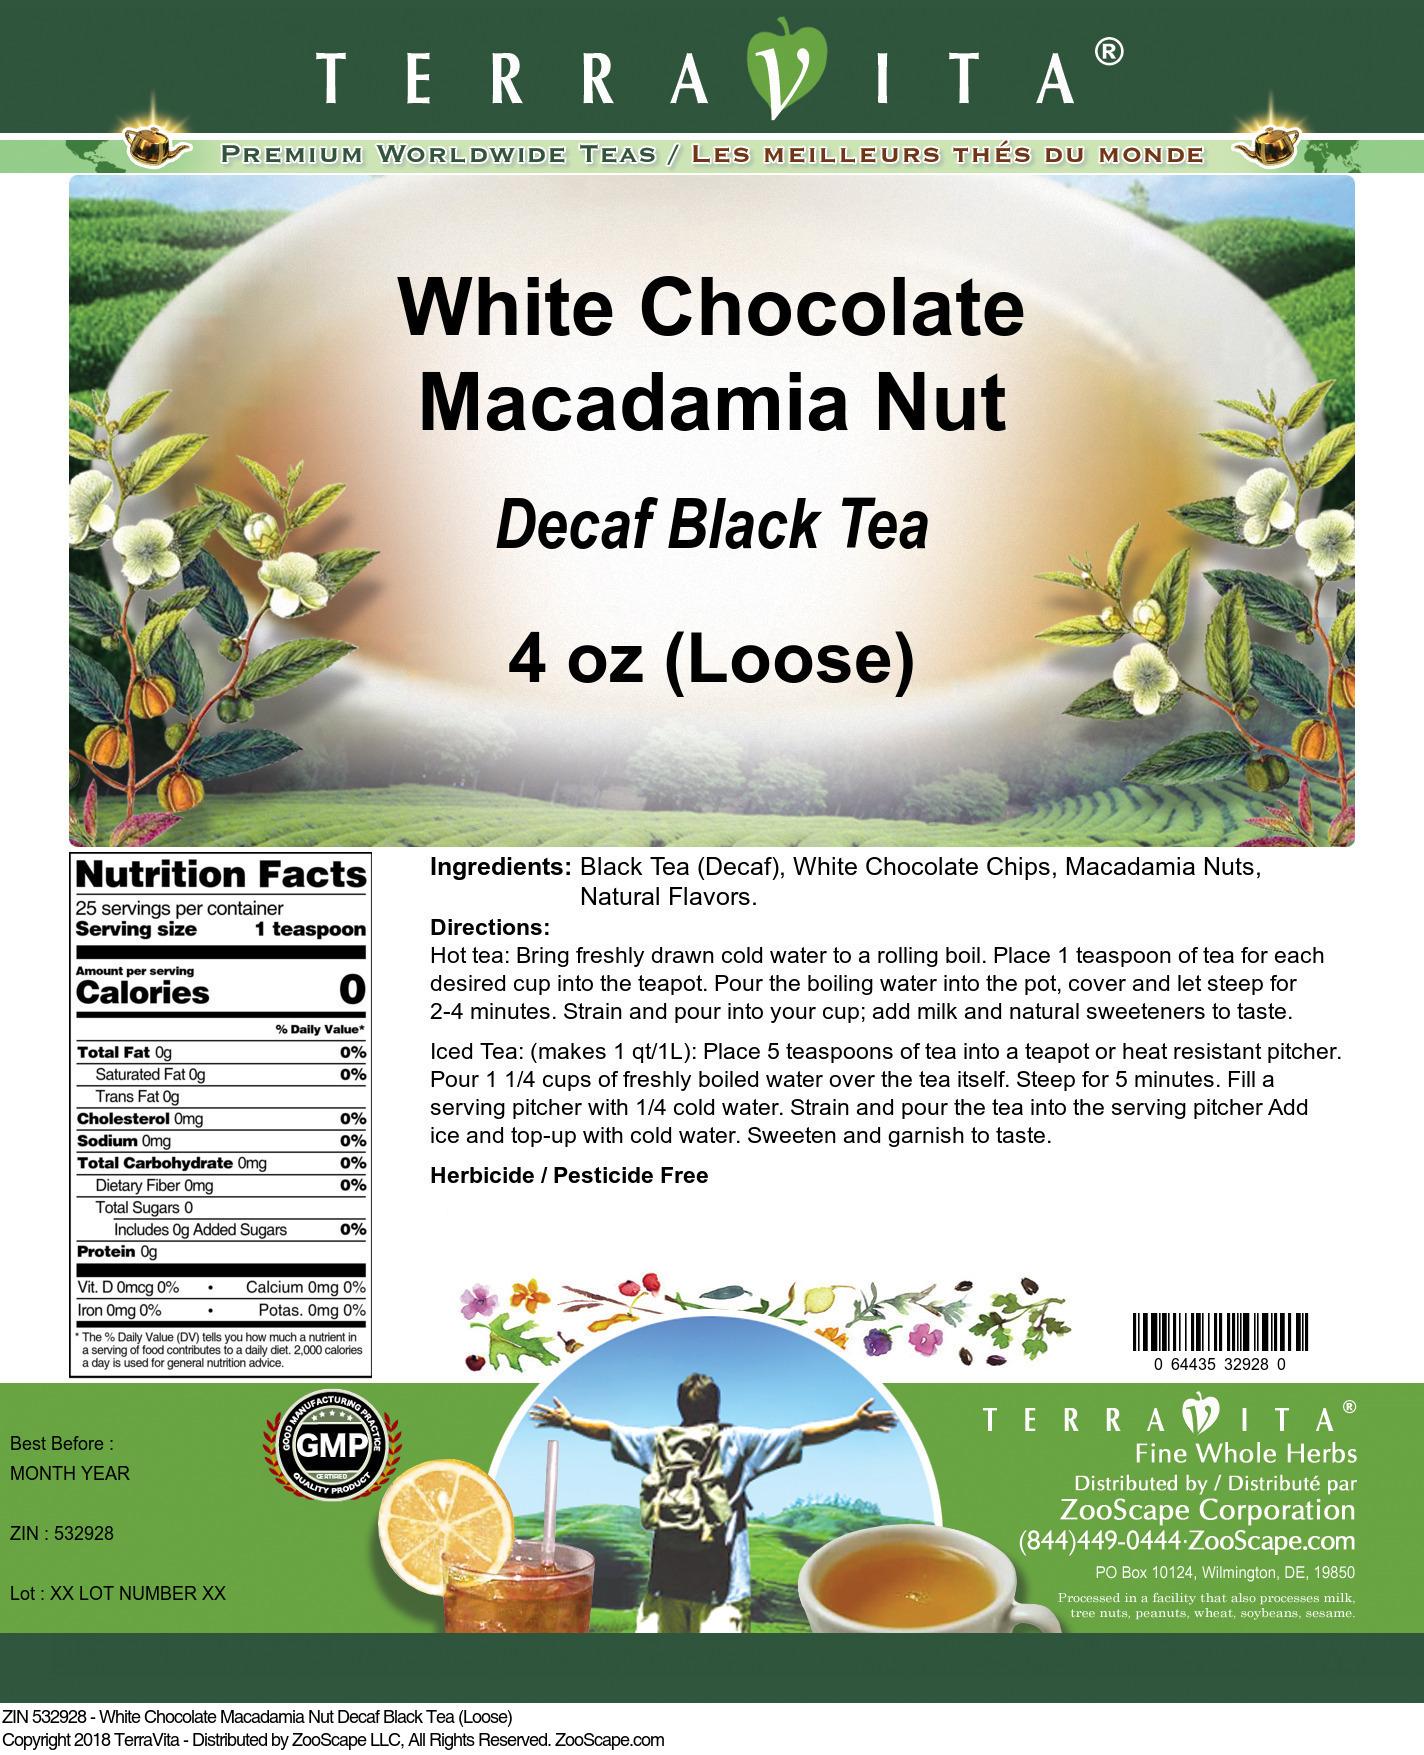 White Chocolate Macadamia Nut Decaf Black Tea (Loose)